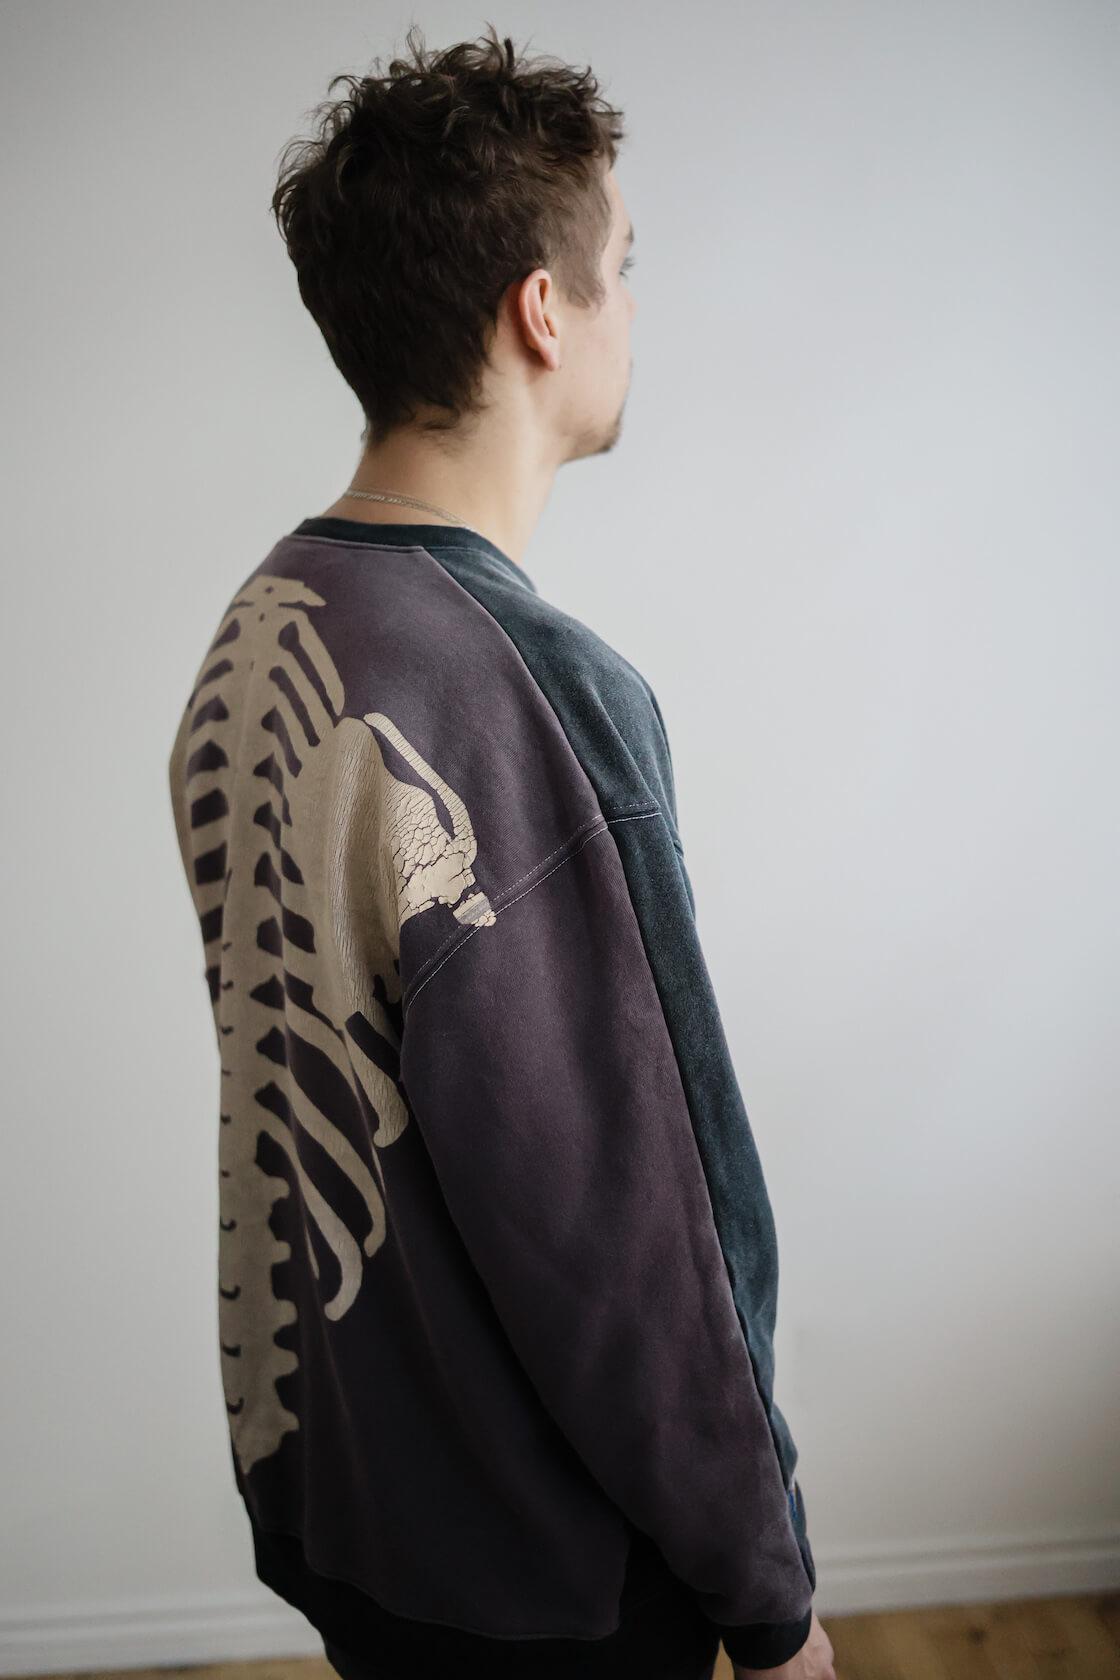 kapital fleece knit 20tones remake big sweat (bone), orslow 107 ivy denim and New balance m2002 protection pack on body